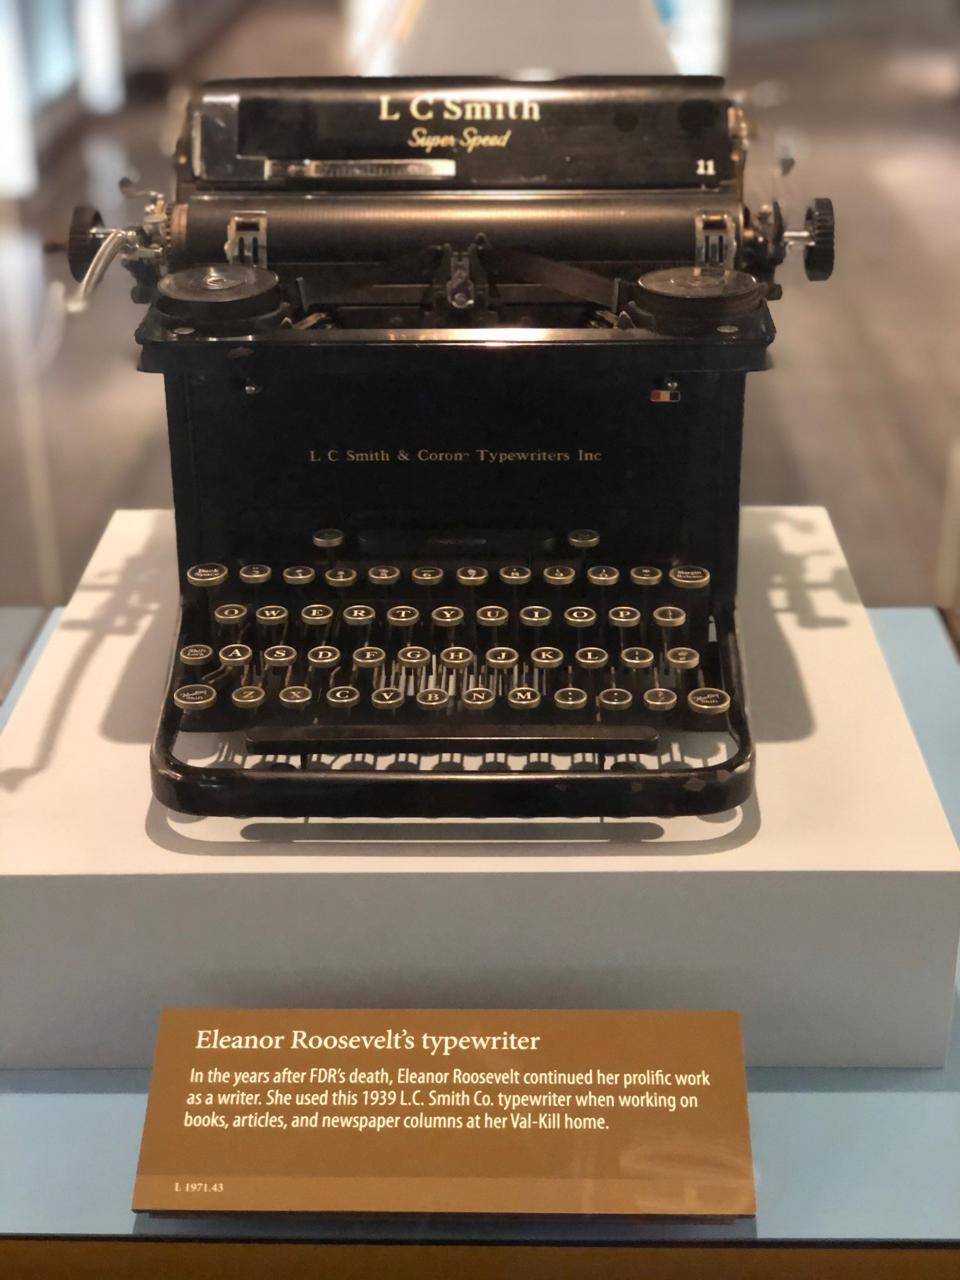 Eleanor Roosevelt's typewriter.